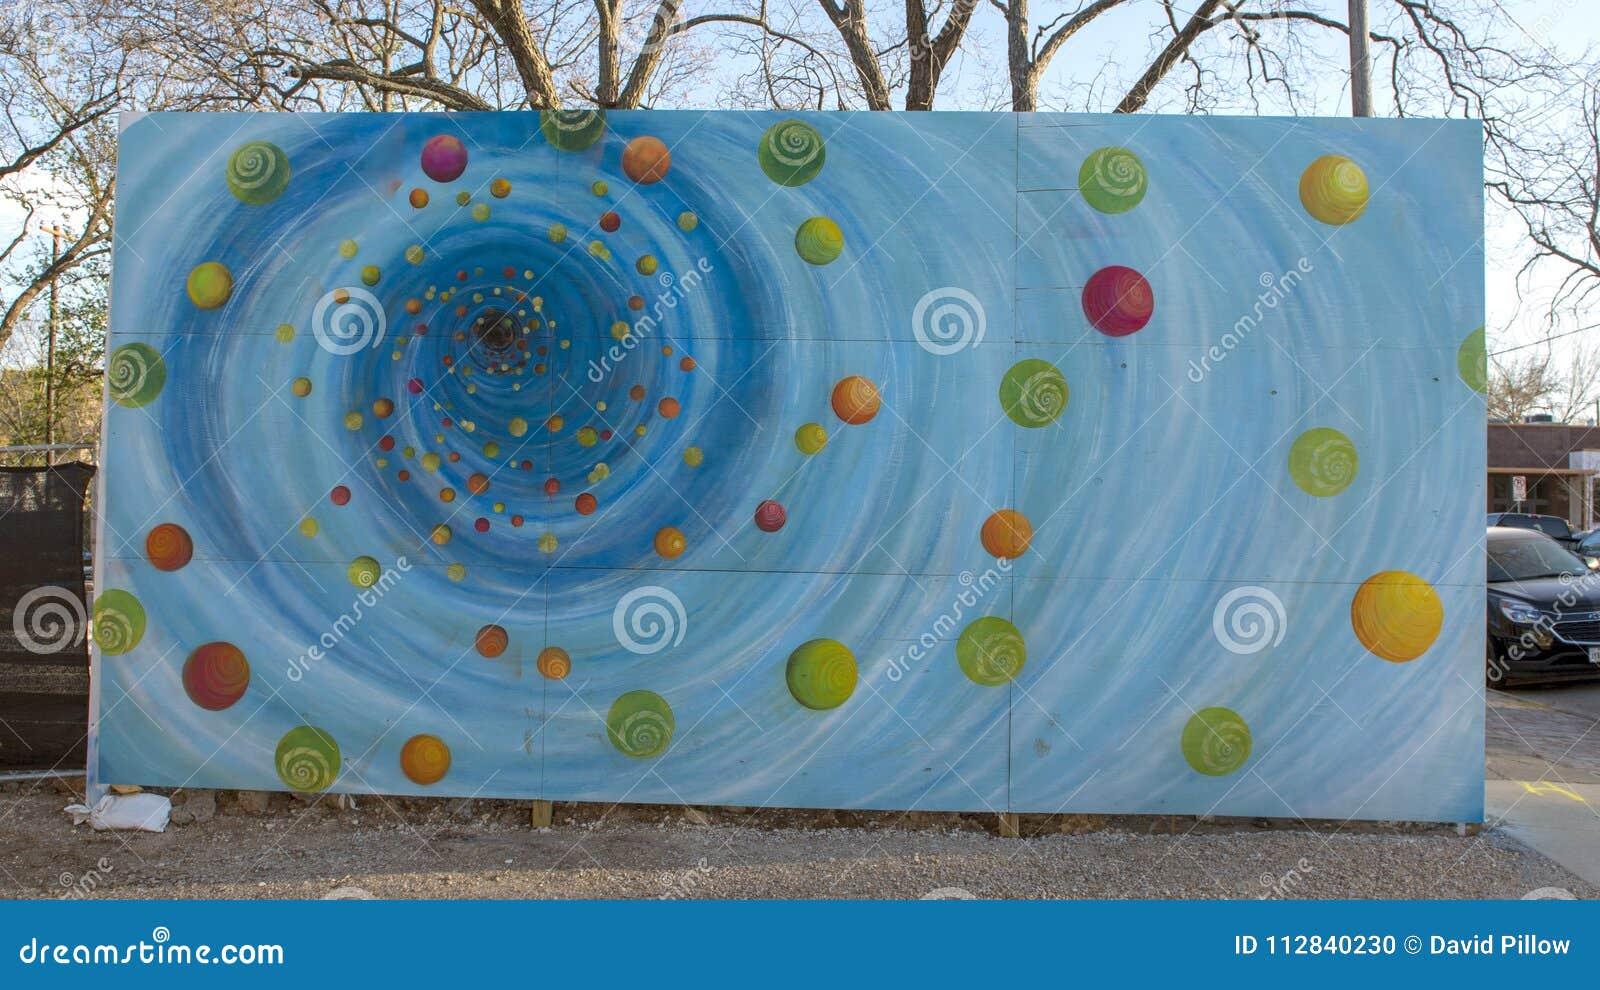 Mural περιοχή τεχνών επισκόπων μαύρων τρυπών, Ντάλλας, Τέξας